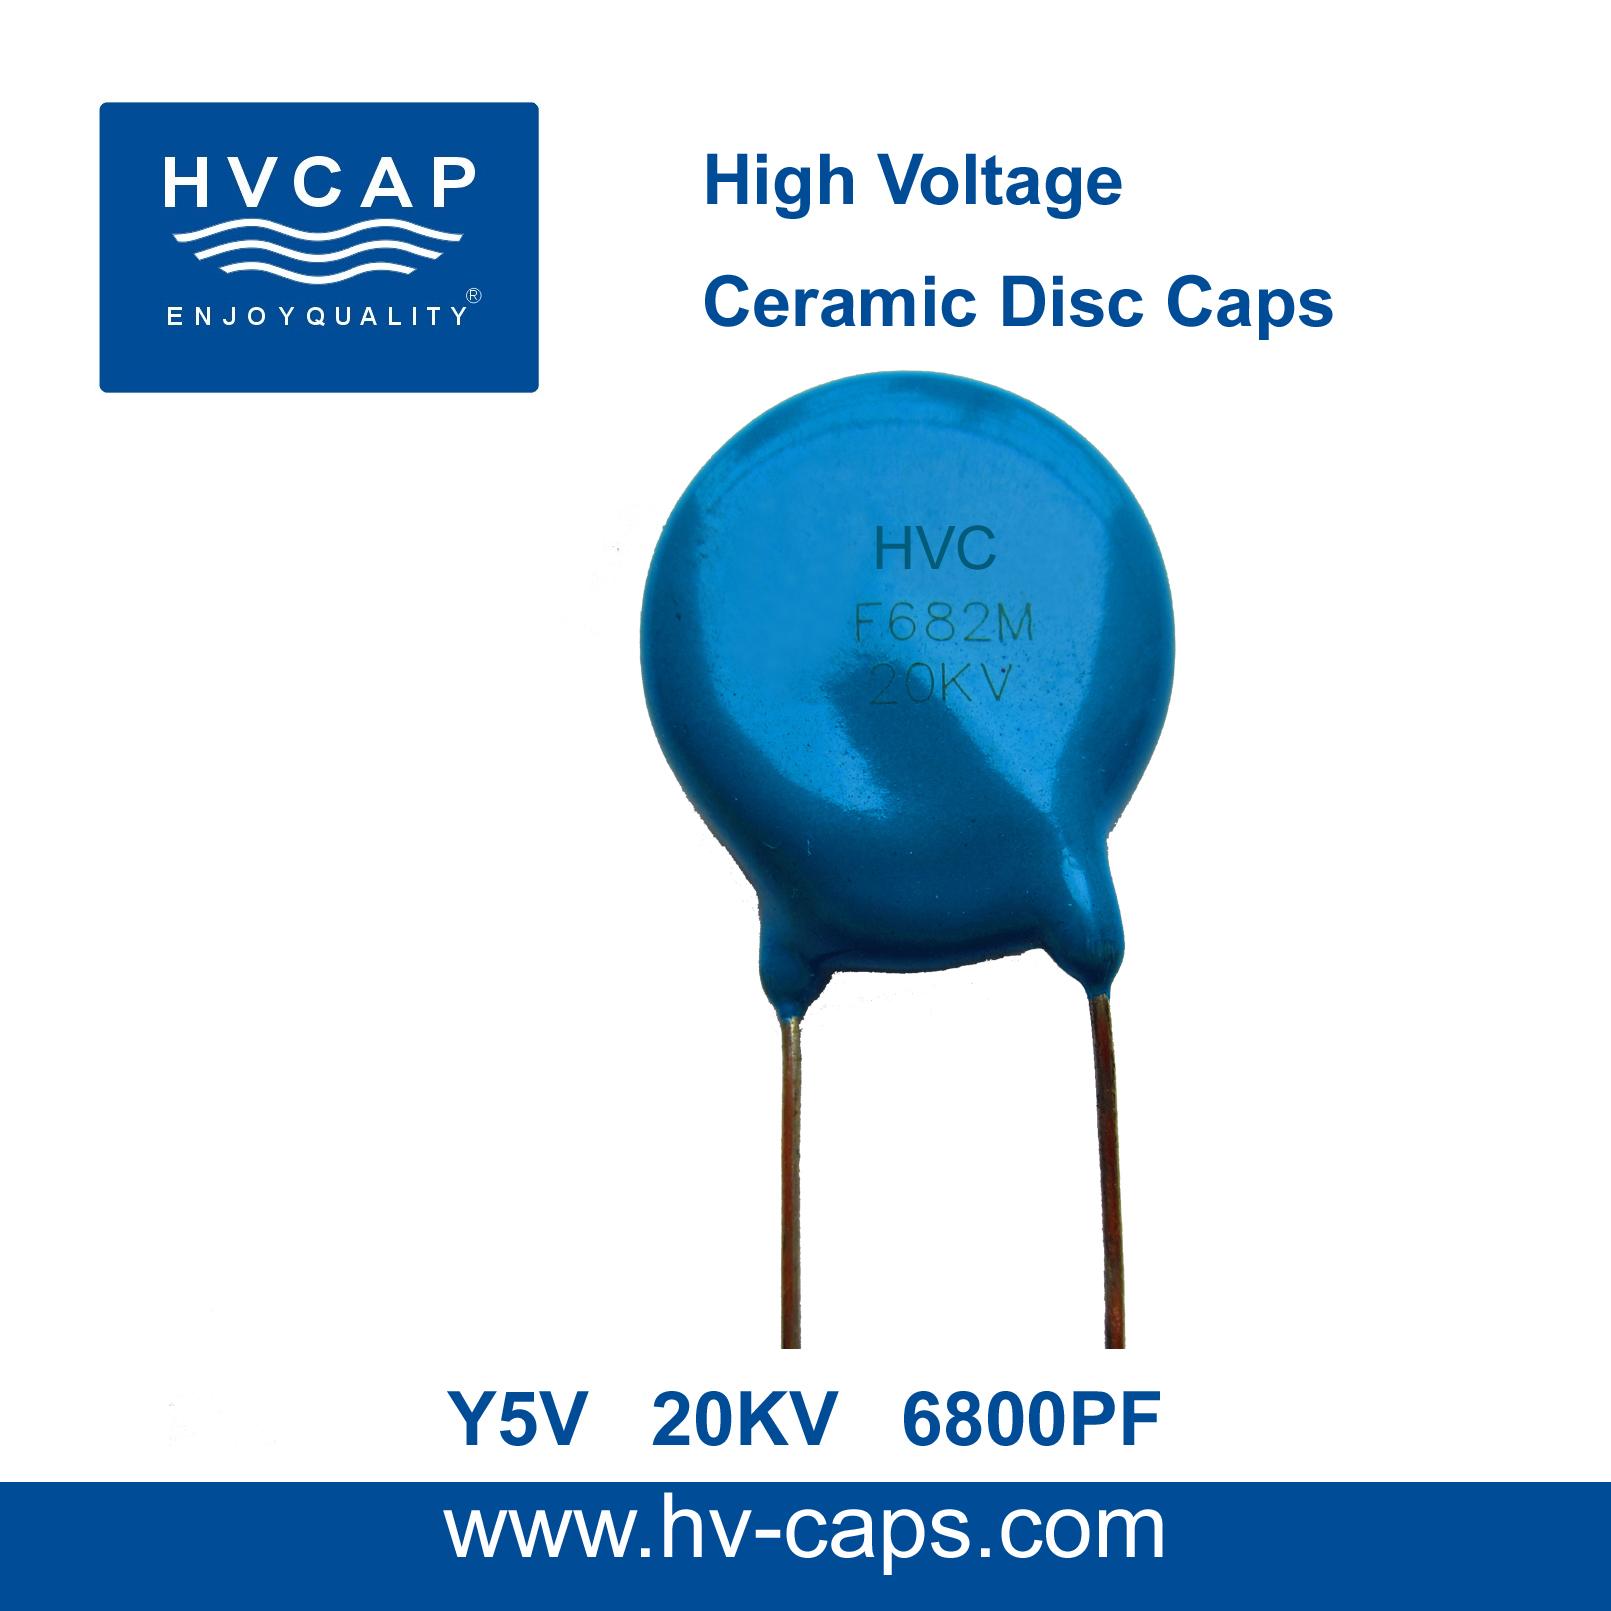 Hoë Spanning Keramiese Skyfkondensator 20KV 6800PF (20KV 682M)